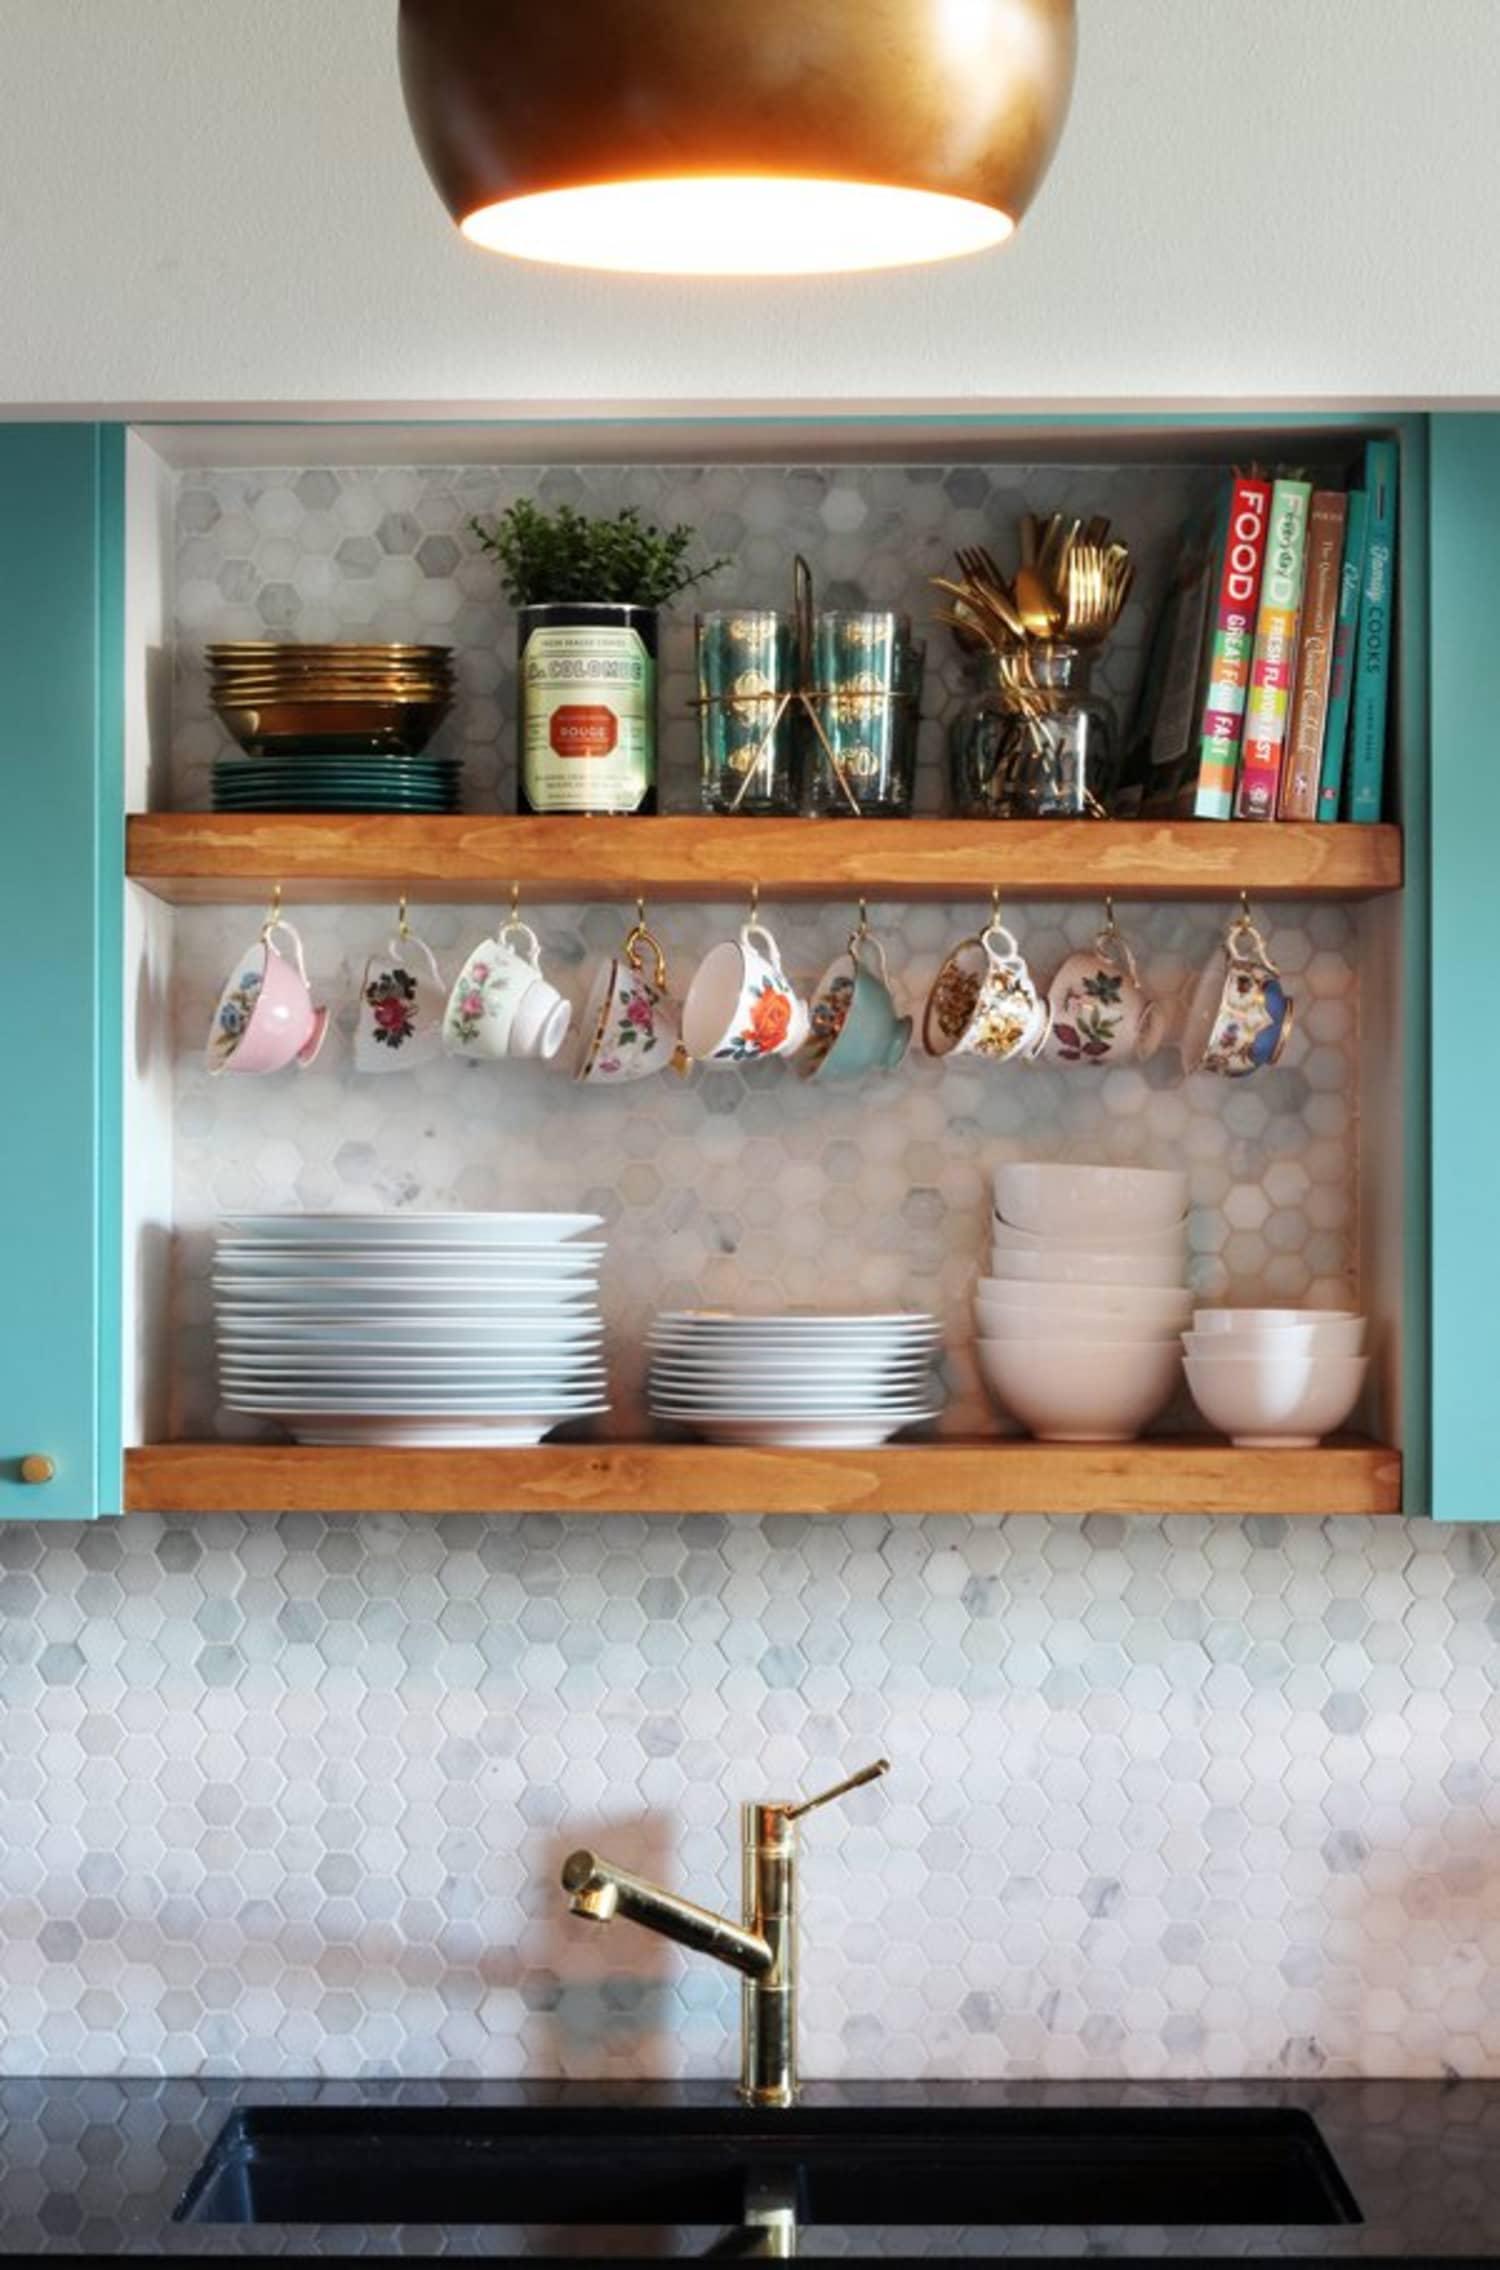 The Best Kitchen Shelf Ideas - Open Kitchen Shelving Ideas